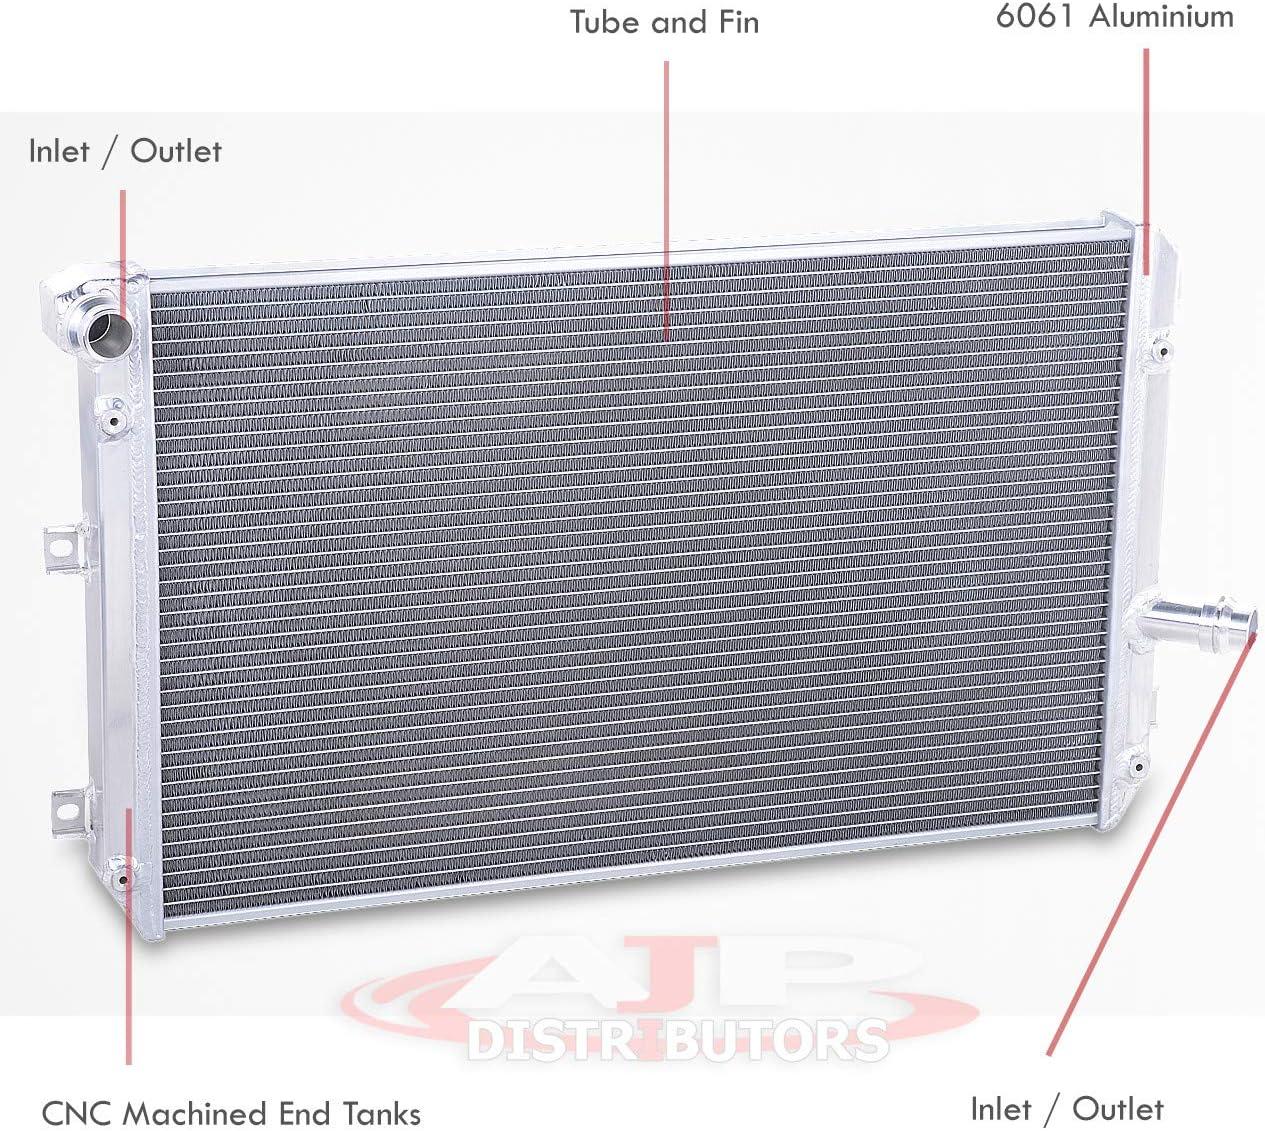 FOR 06-14 VW JETTA AUDI TT A3 2.0T 2.0 TDI 2-ROW FULL ALUMINUM COOLING RADIATOR